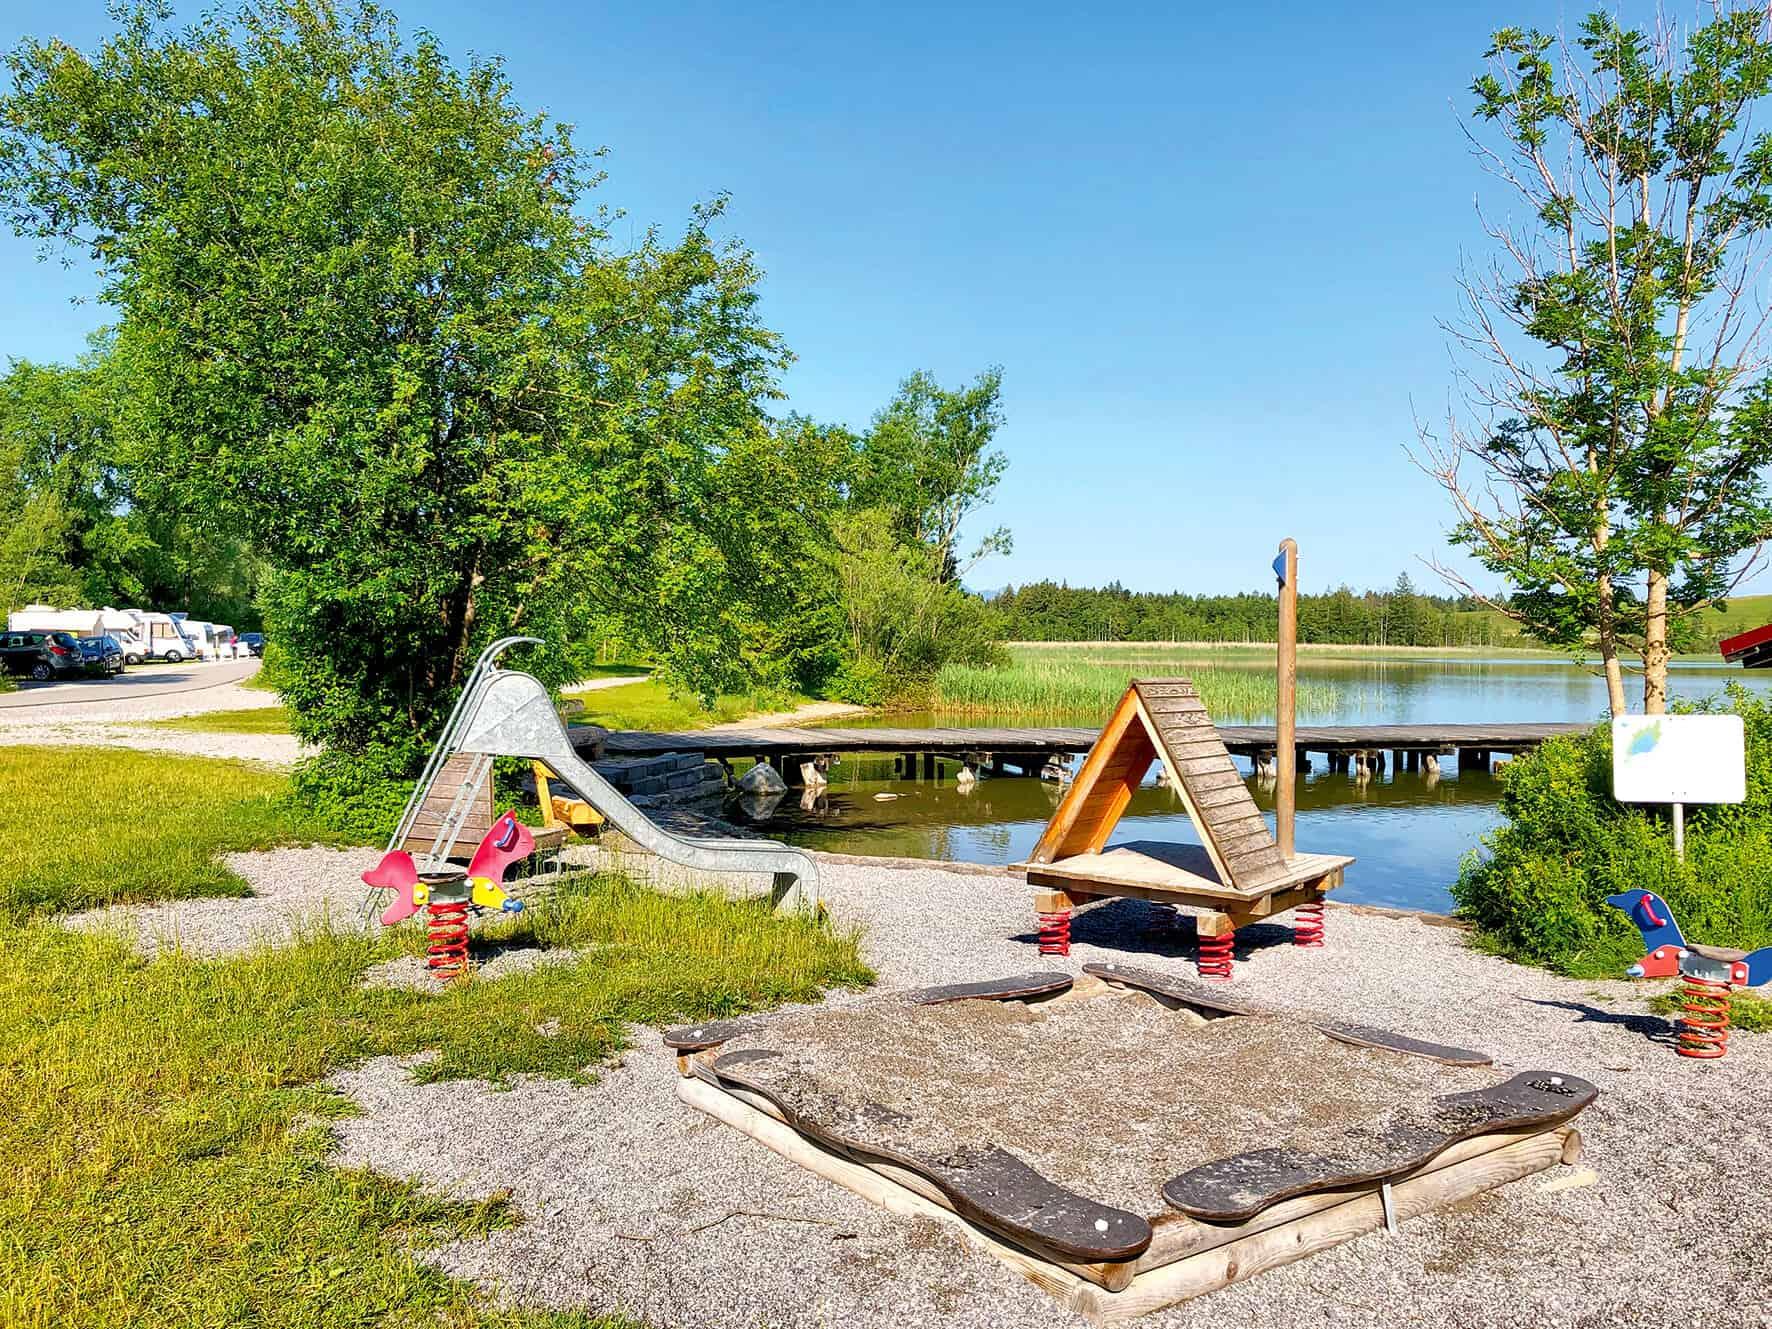 Kinderspielplatz Camping Bannwaldsee